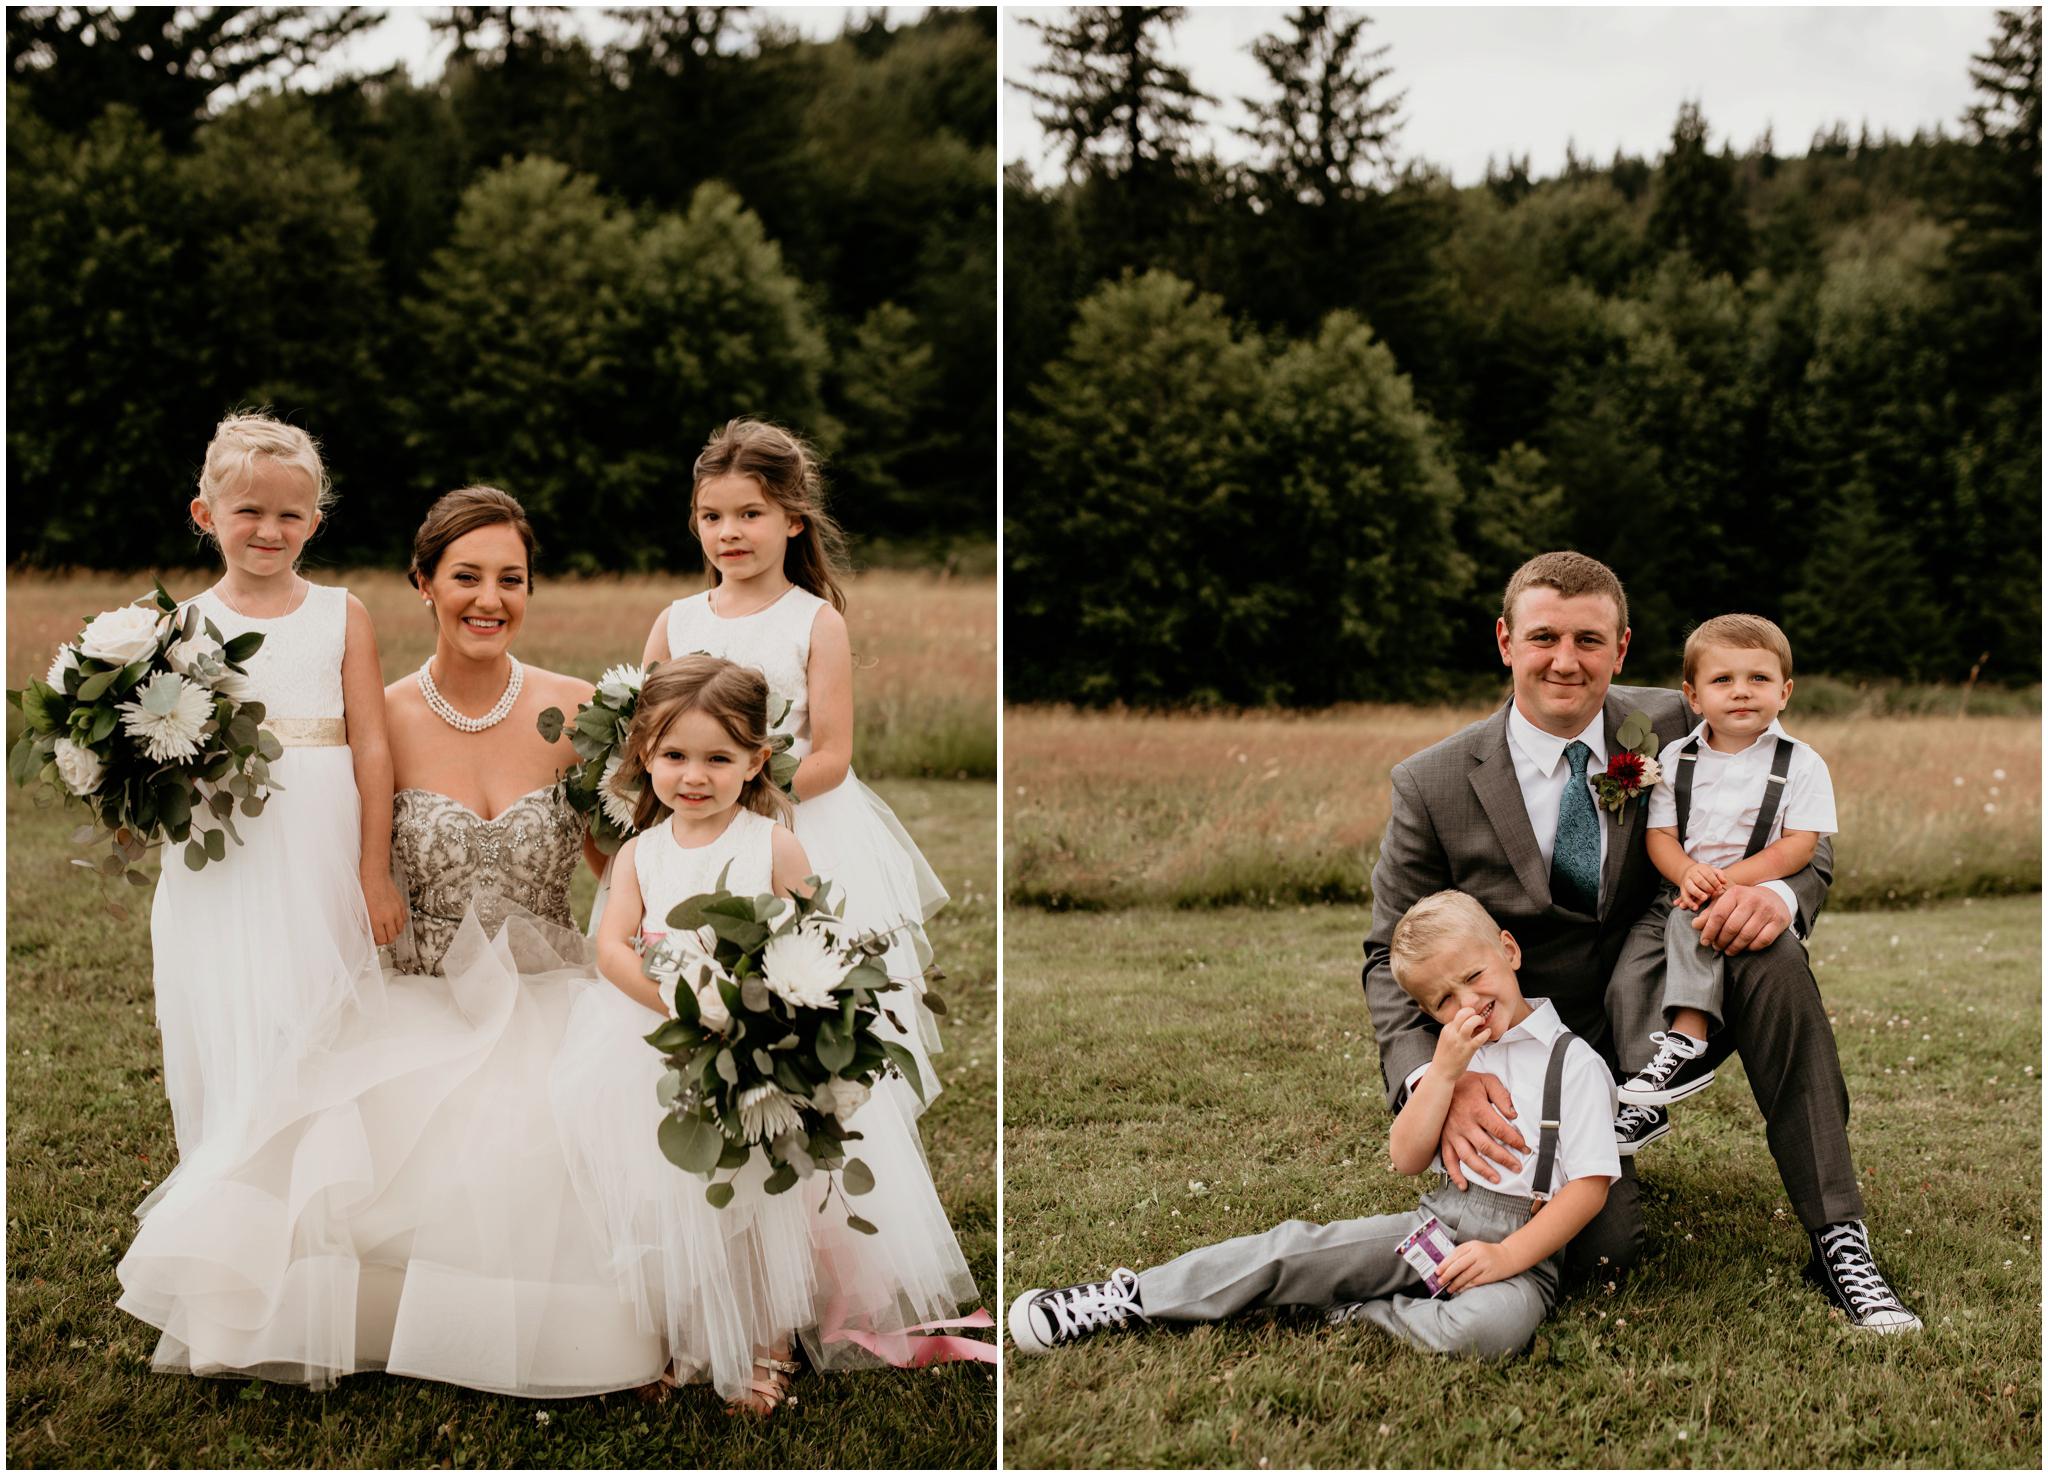 alex-and-matthew-three-cs-farm-venue-seattle-wedding-photographer-066.jpg